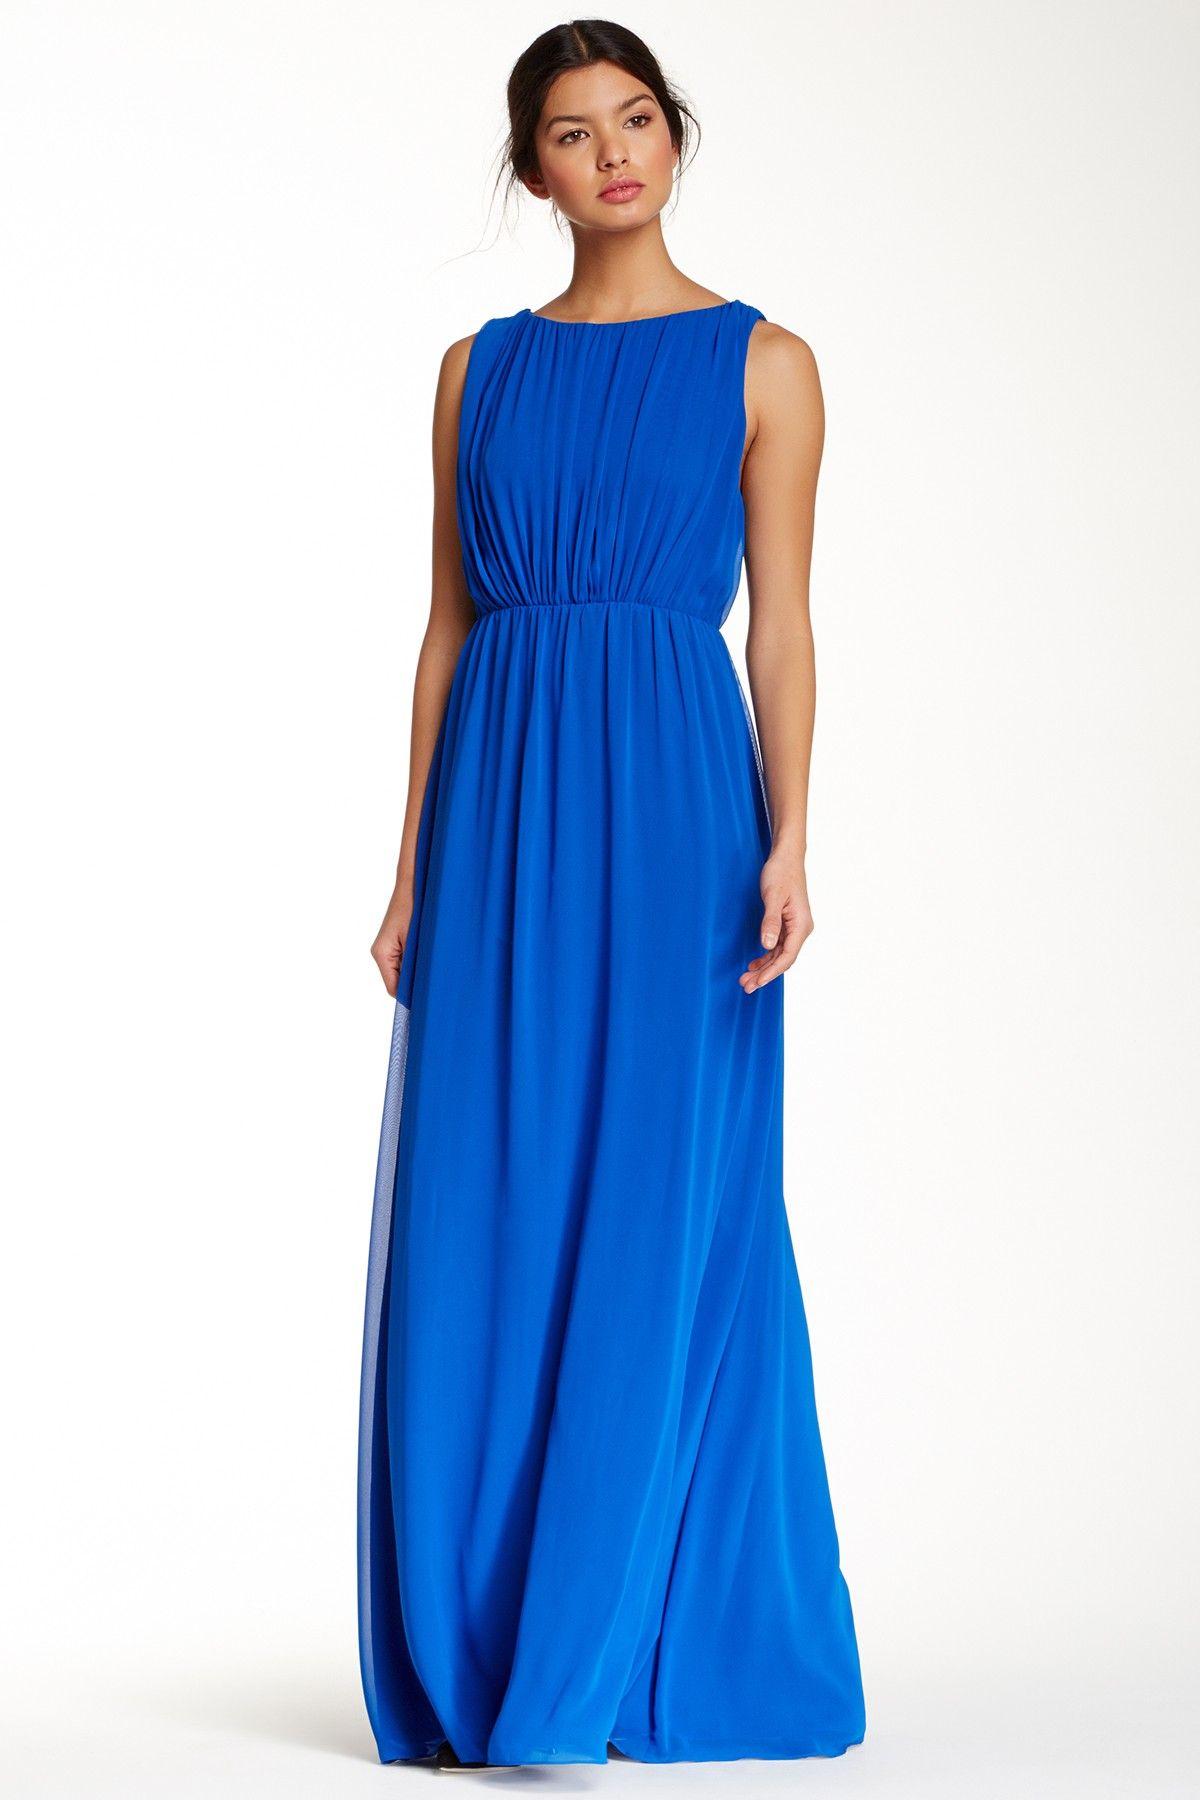 Alice Olivia Soleil Silk Blend Bright Blue Maxi Dress Nordstrom Rack Maxi Dress Dresses Maxi Skirt Dress